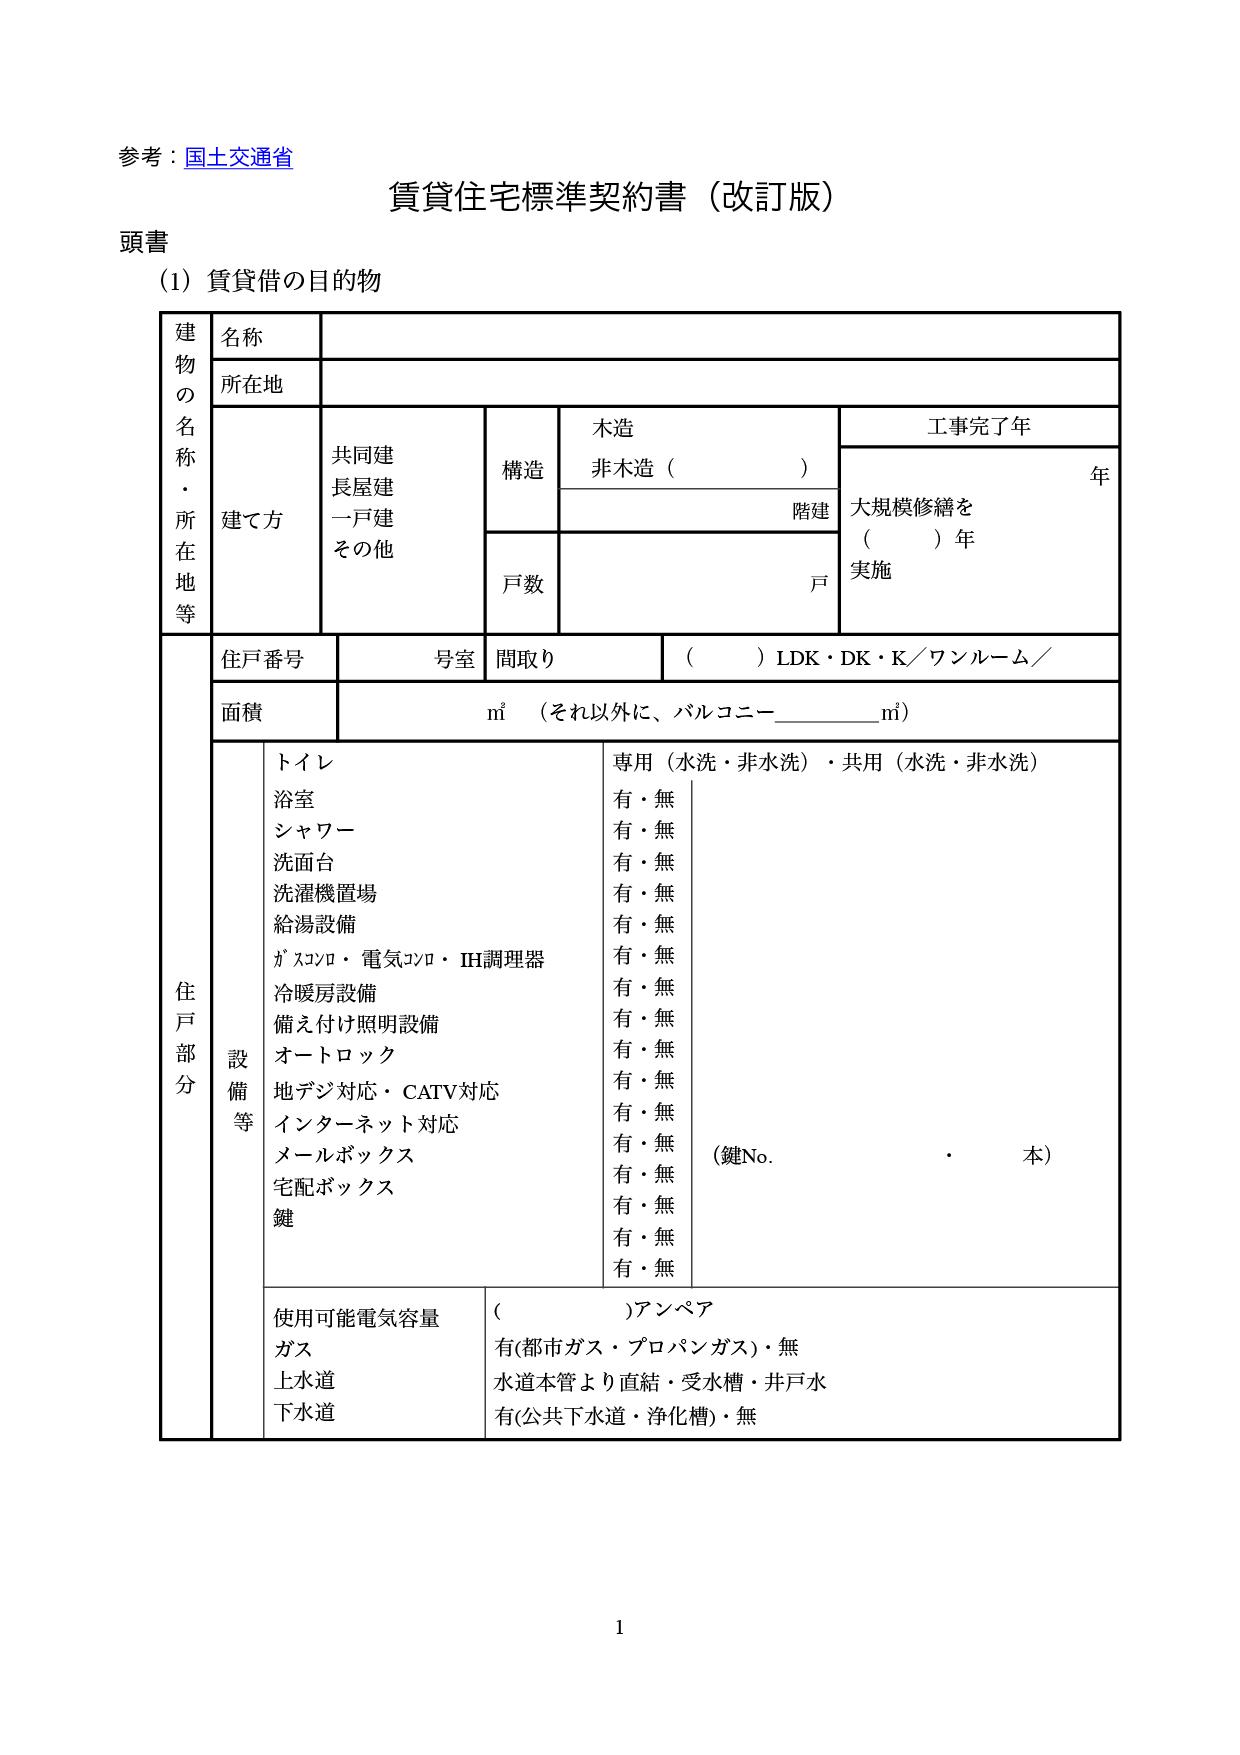 賃貸住宅標準契約書テンプレート(改訂版)国土交通省(ワード